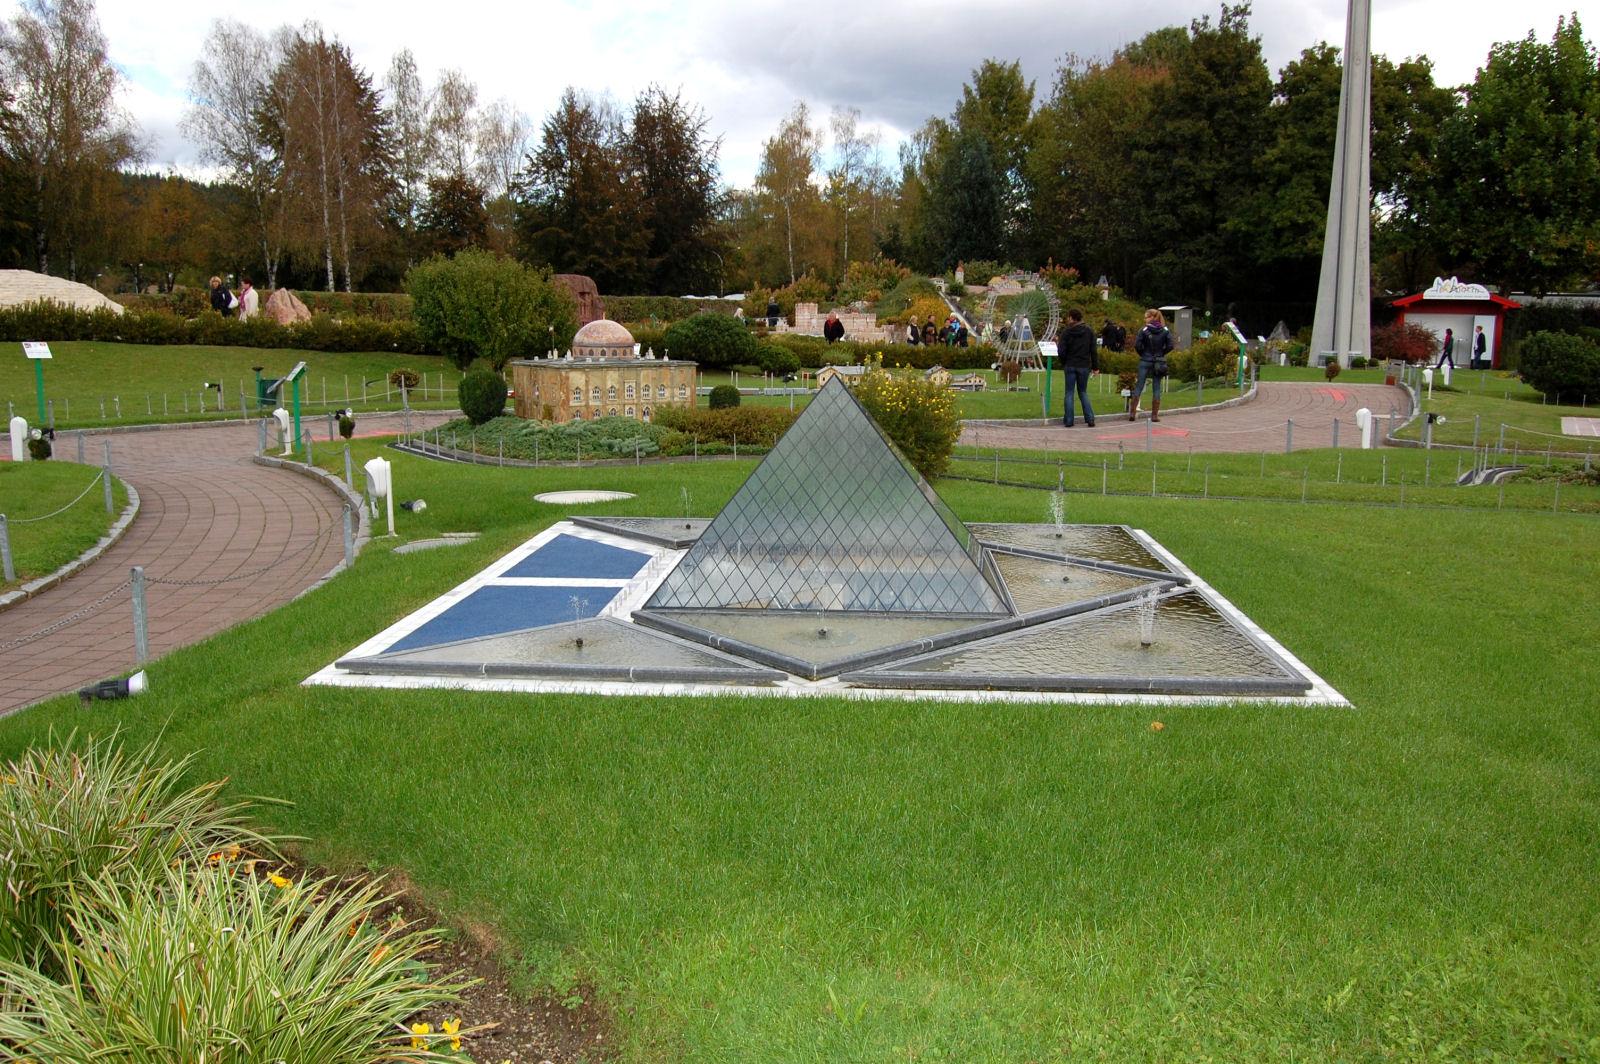 Minimundus miniature park in Klagenfurt, Carinthia, Austria